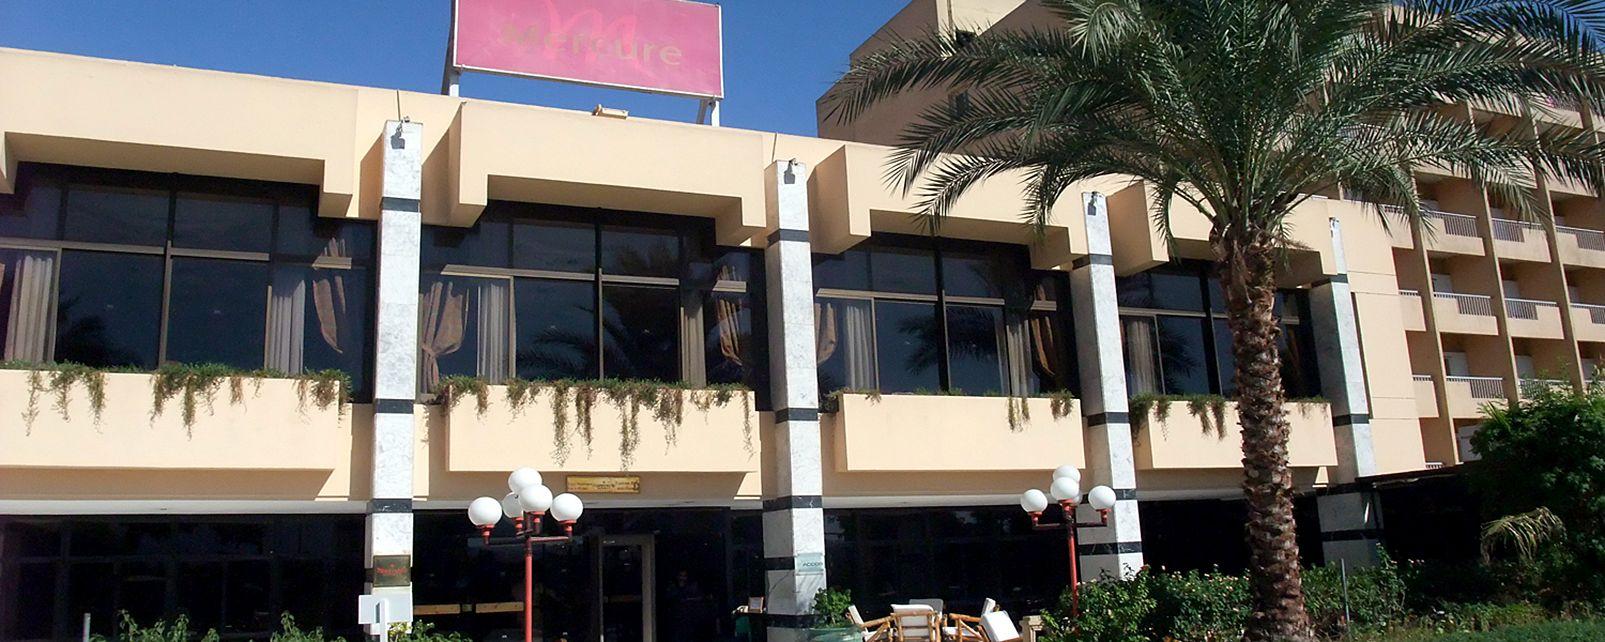 Hôtel Mercure Luxor